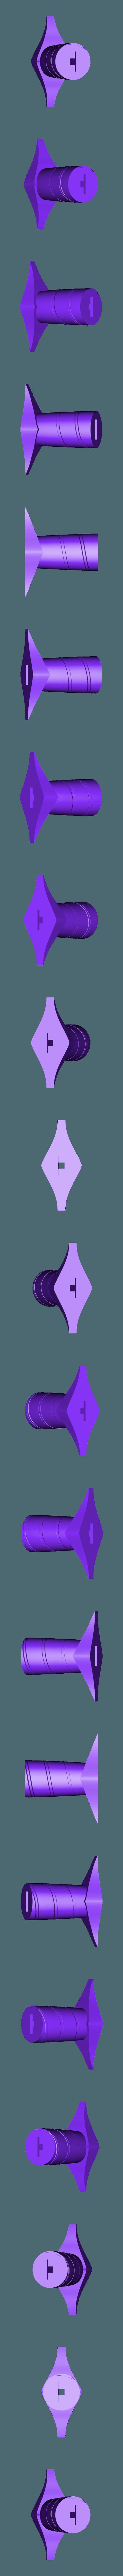 Small_Volume_2.stl Download free STL file V for Vendetta Dagger New and Improved • 3D printer model, stensethjeremy